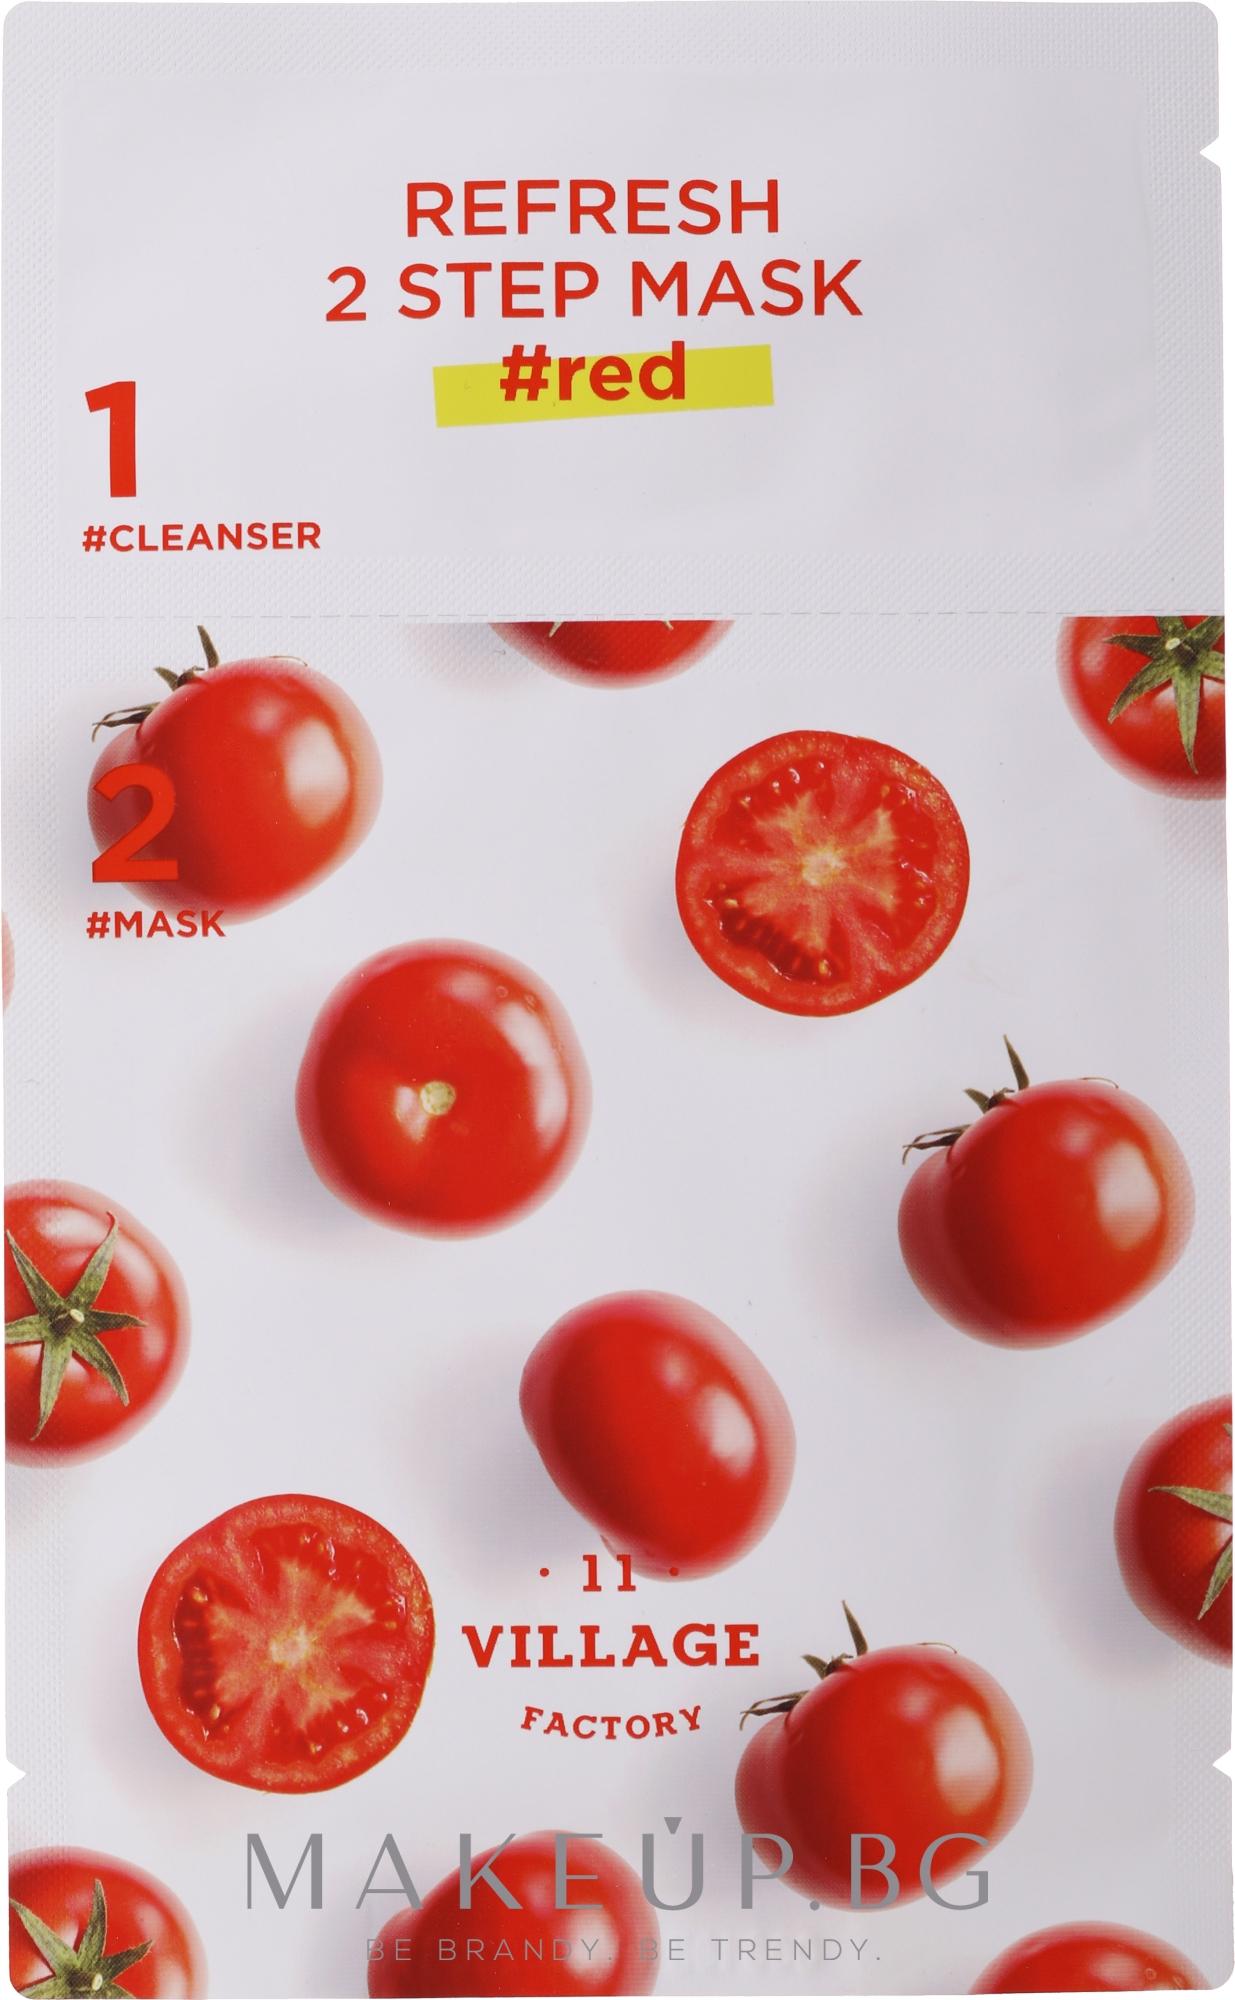 Двуфазна маска за лице с домат - Village 11 Factory Refresh 2-Step Mask Red — снимка 1 бр